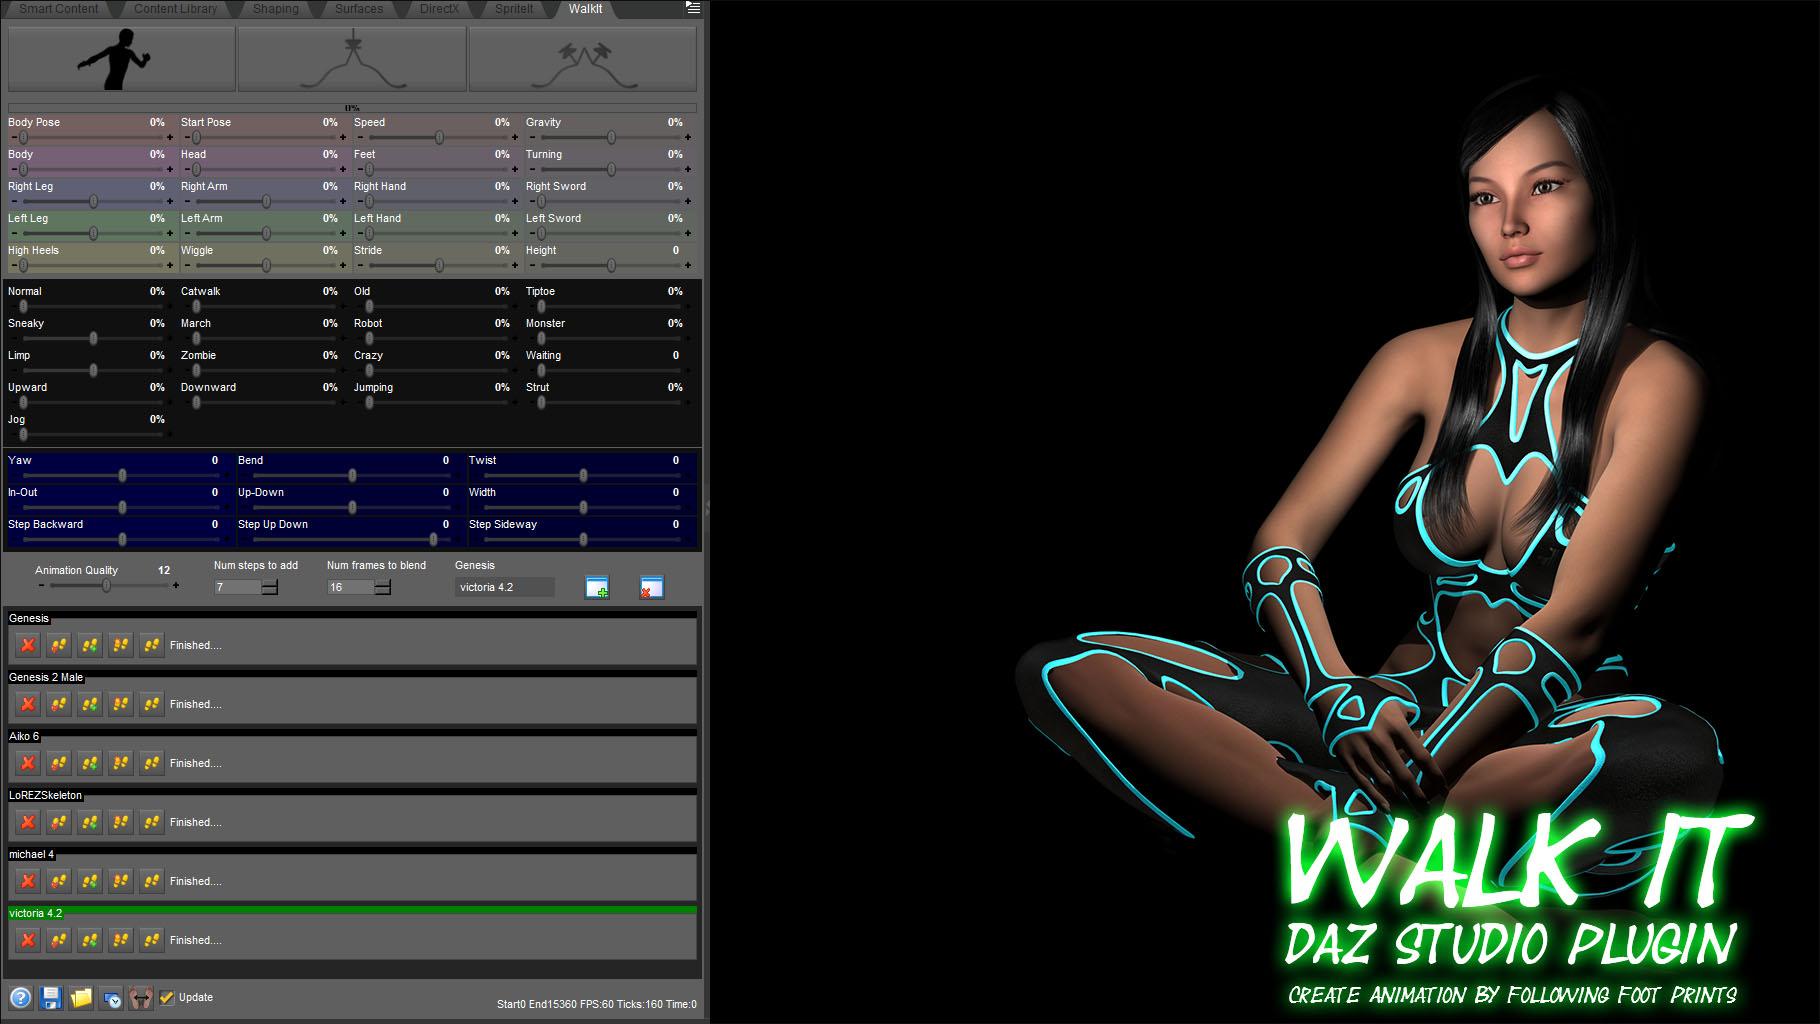 Daz Studio Plugins